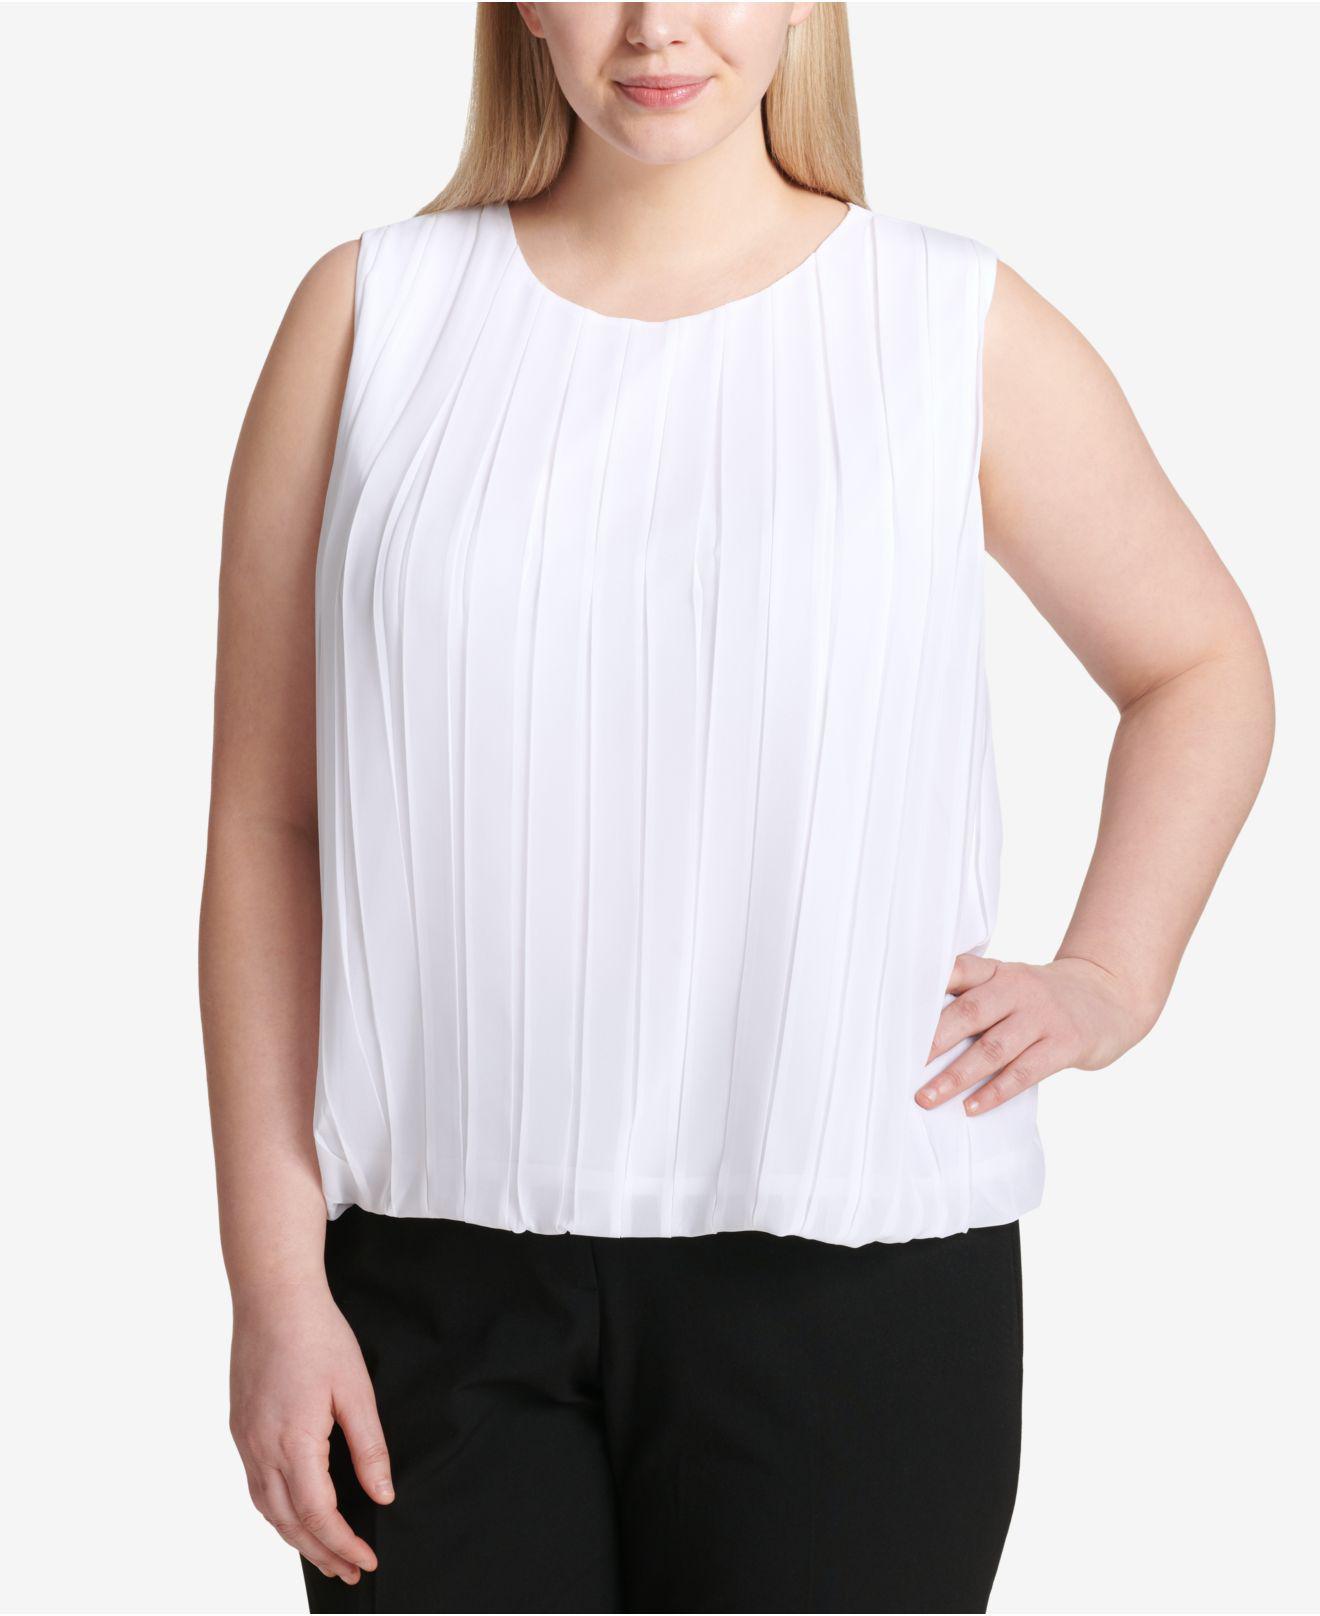 2d12cf171737e Lyst - Calvin Klein Plus Size Pleated Bubble Top in White